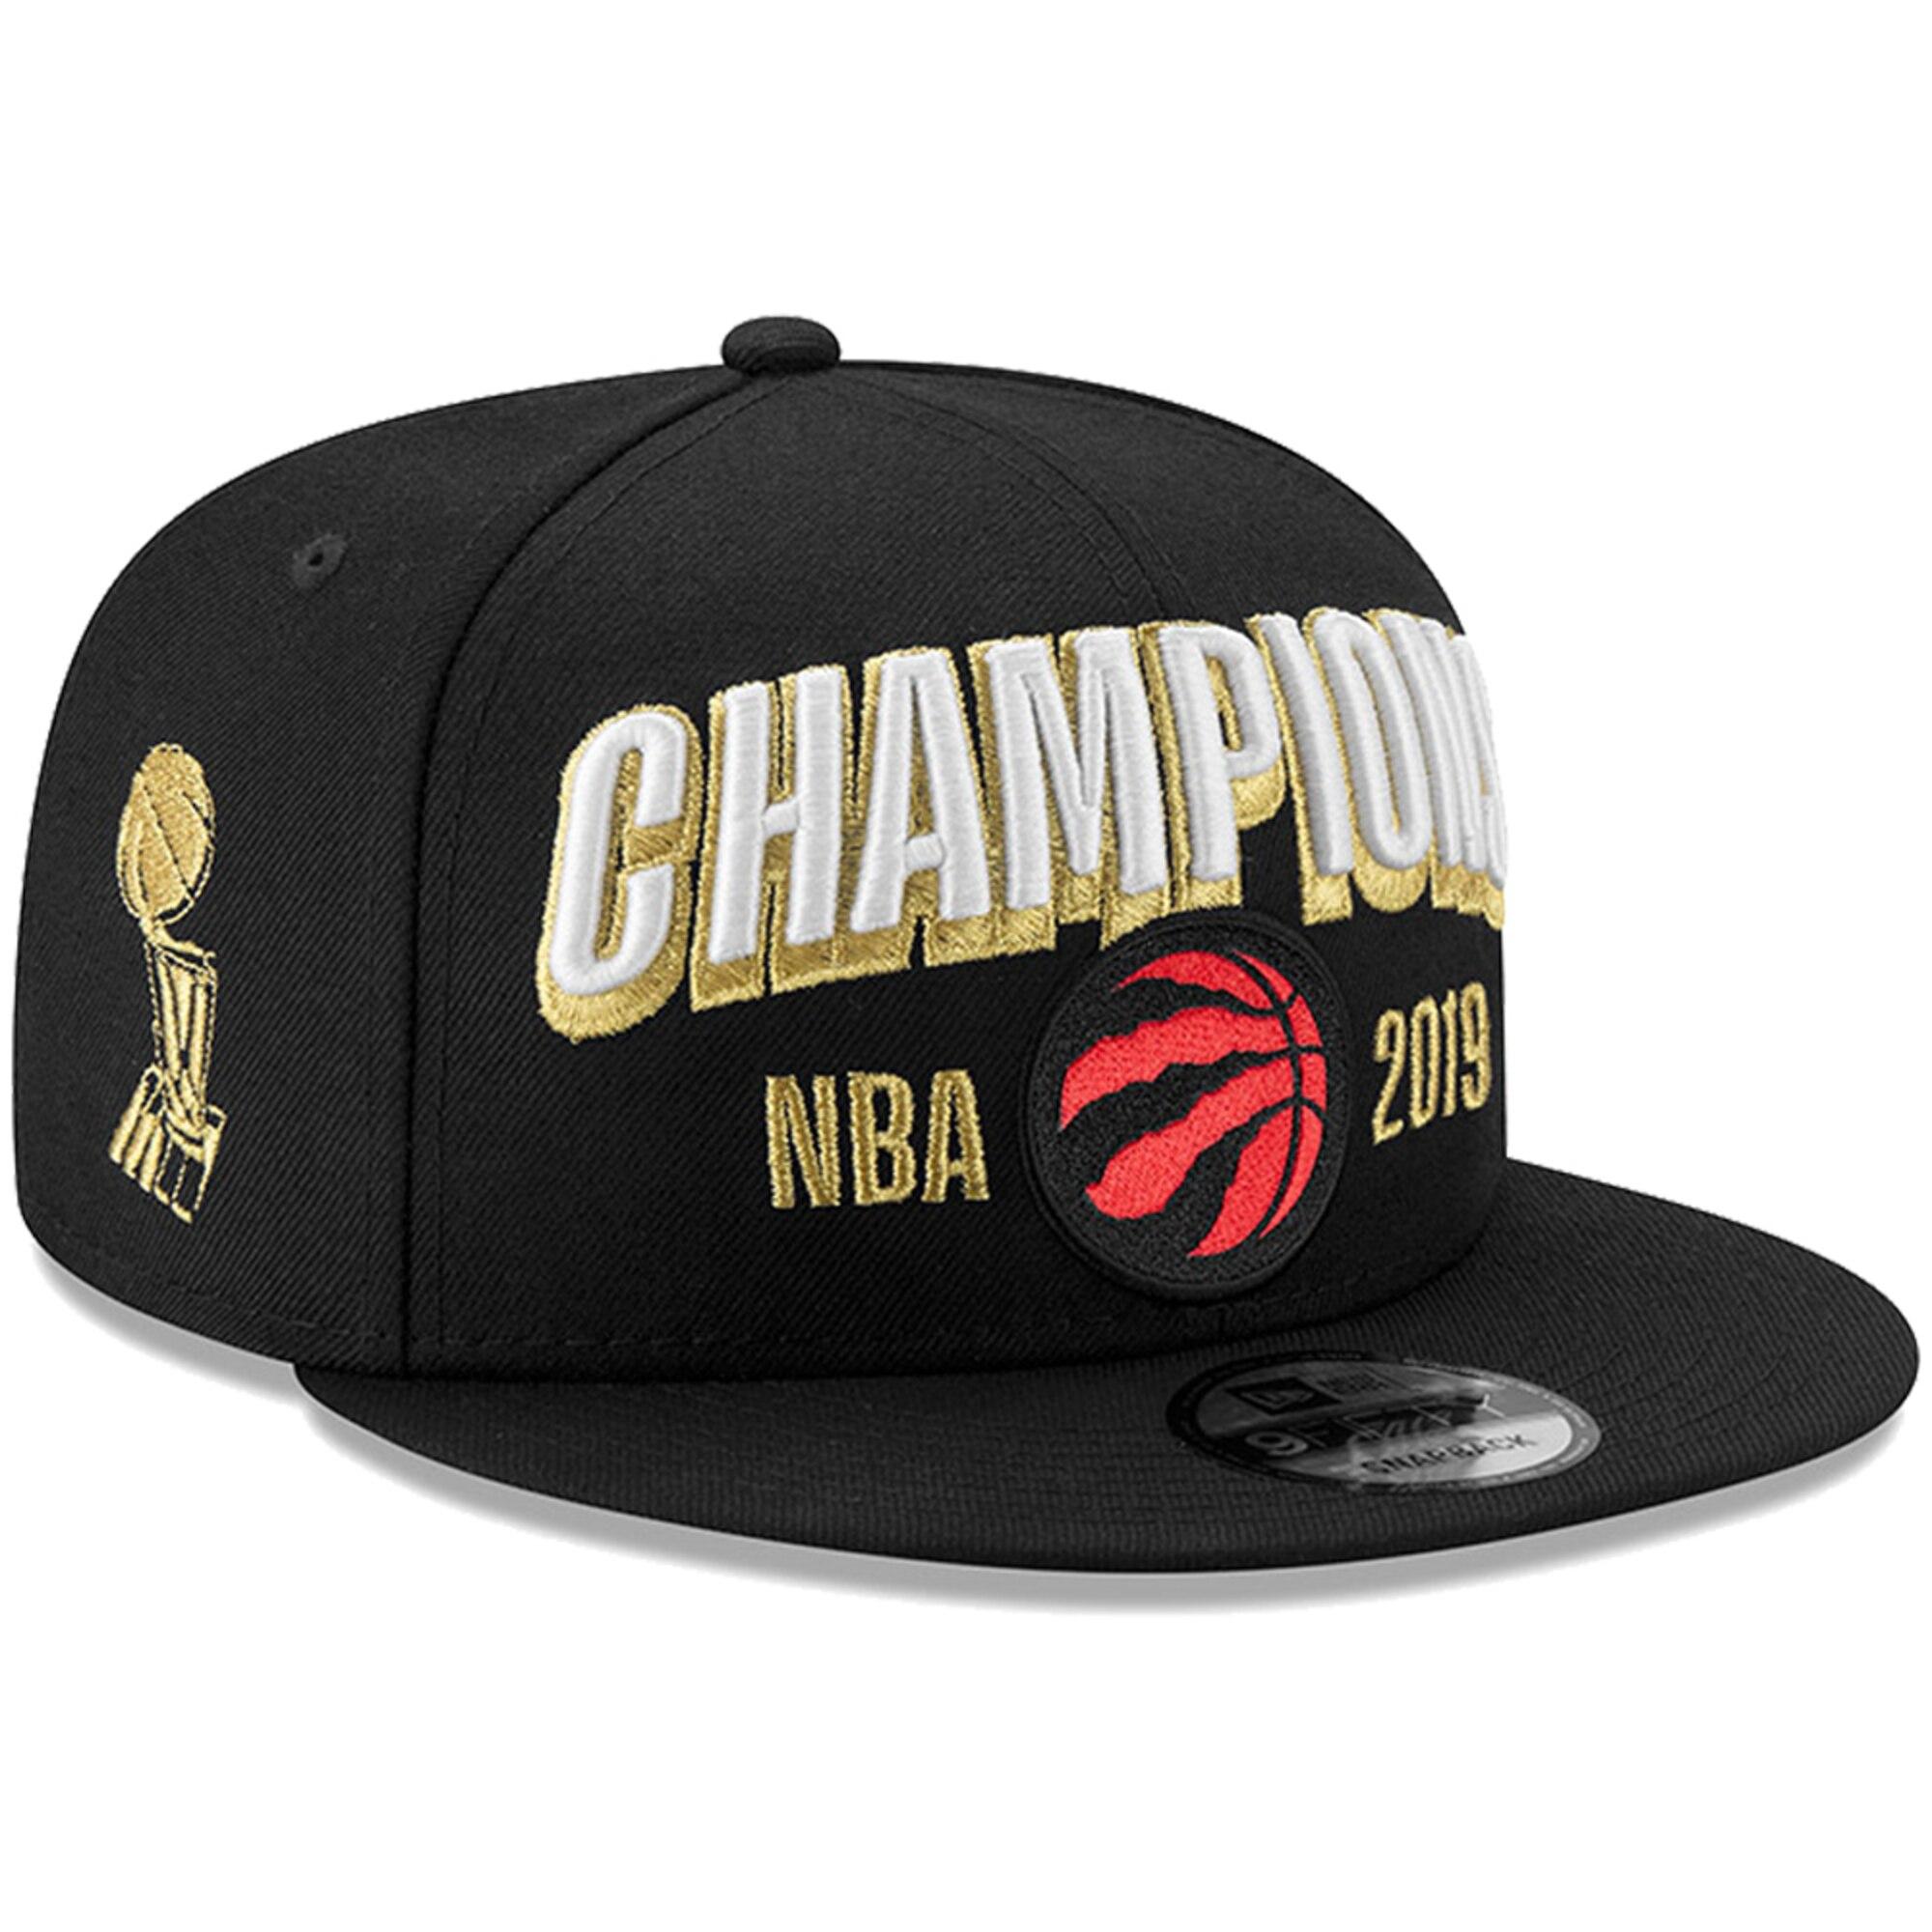 Raptors Team Logo Black 2019 NBA Finals Champions Adjustable Hat SG